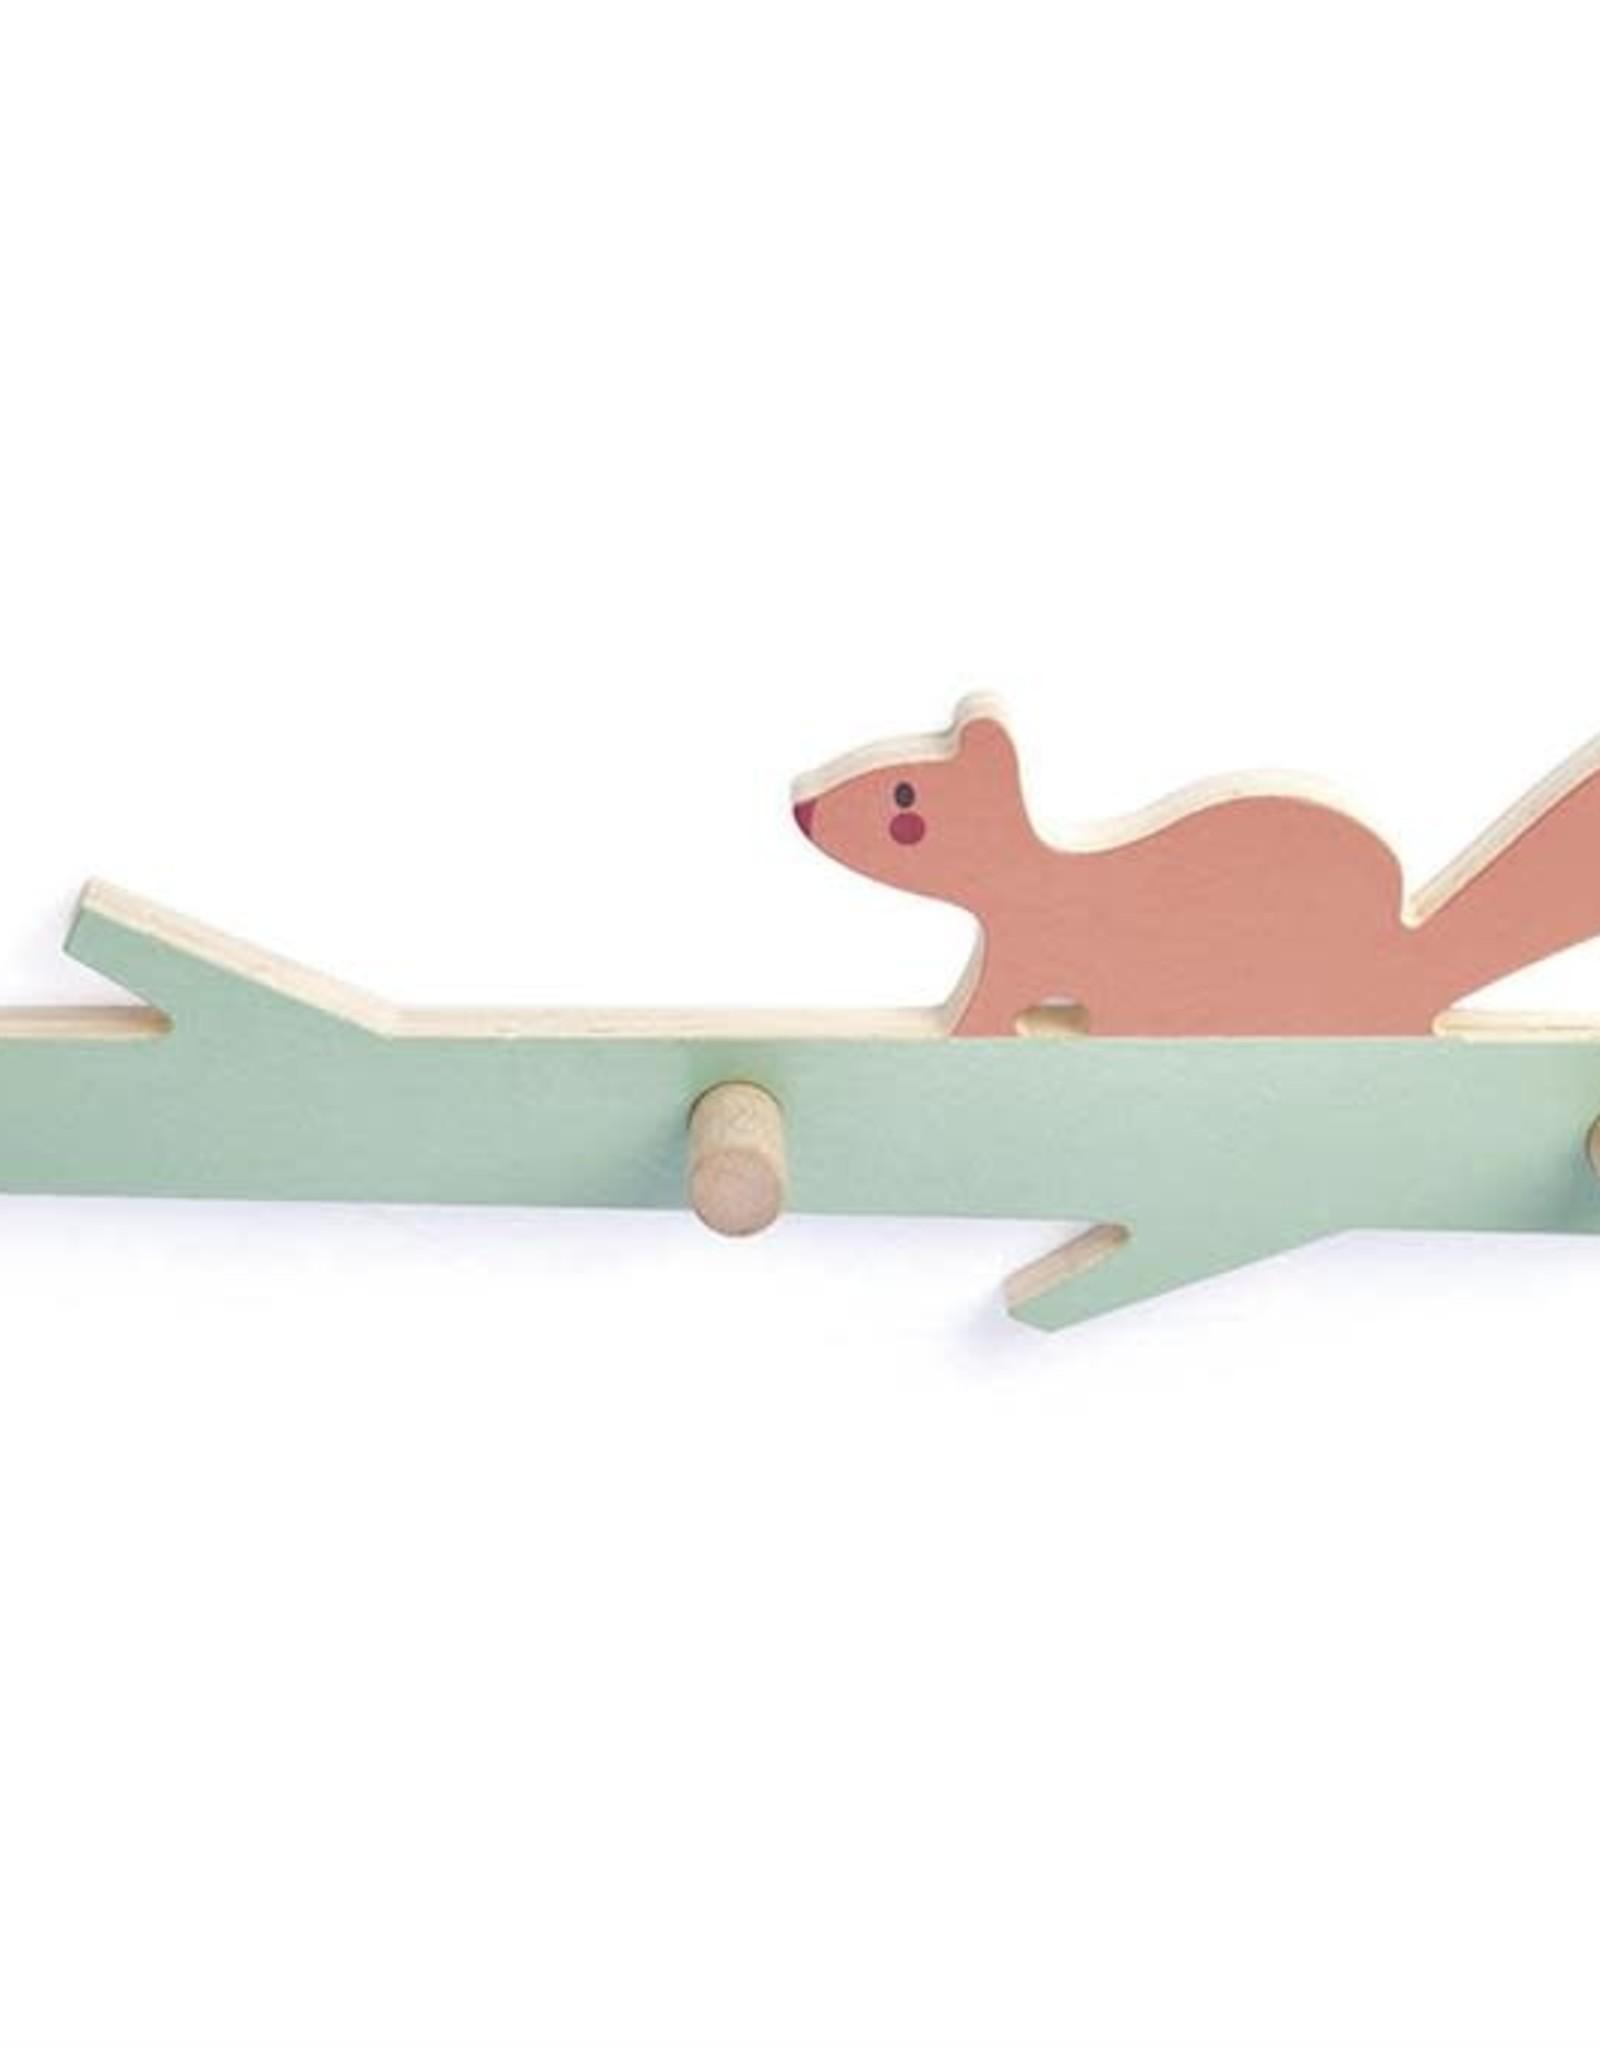 Tender Leaf Toys Kapstokje Eekhoorn